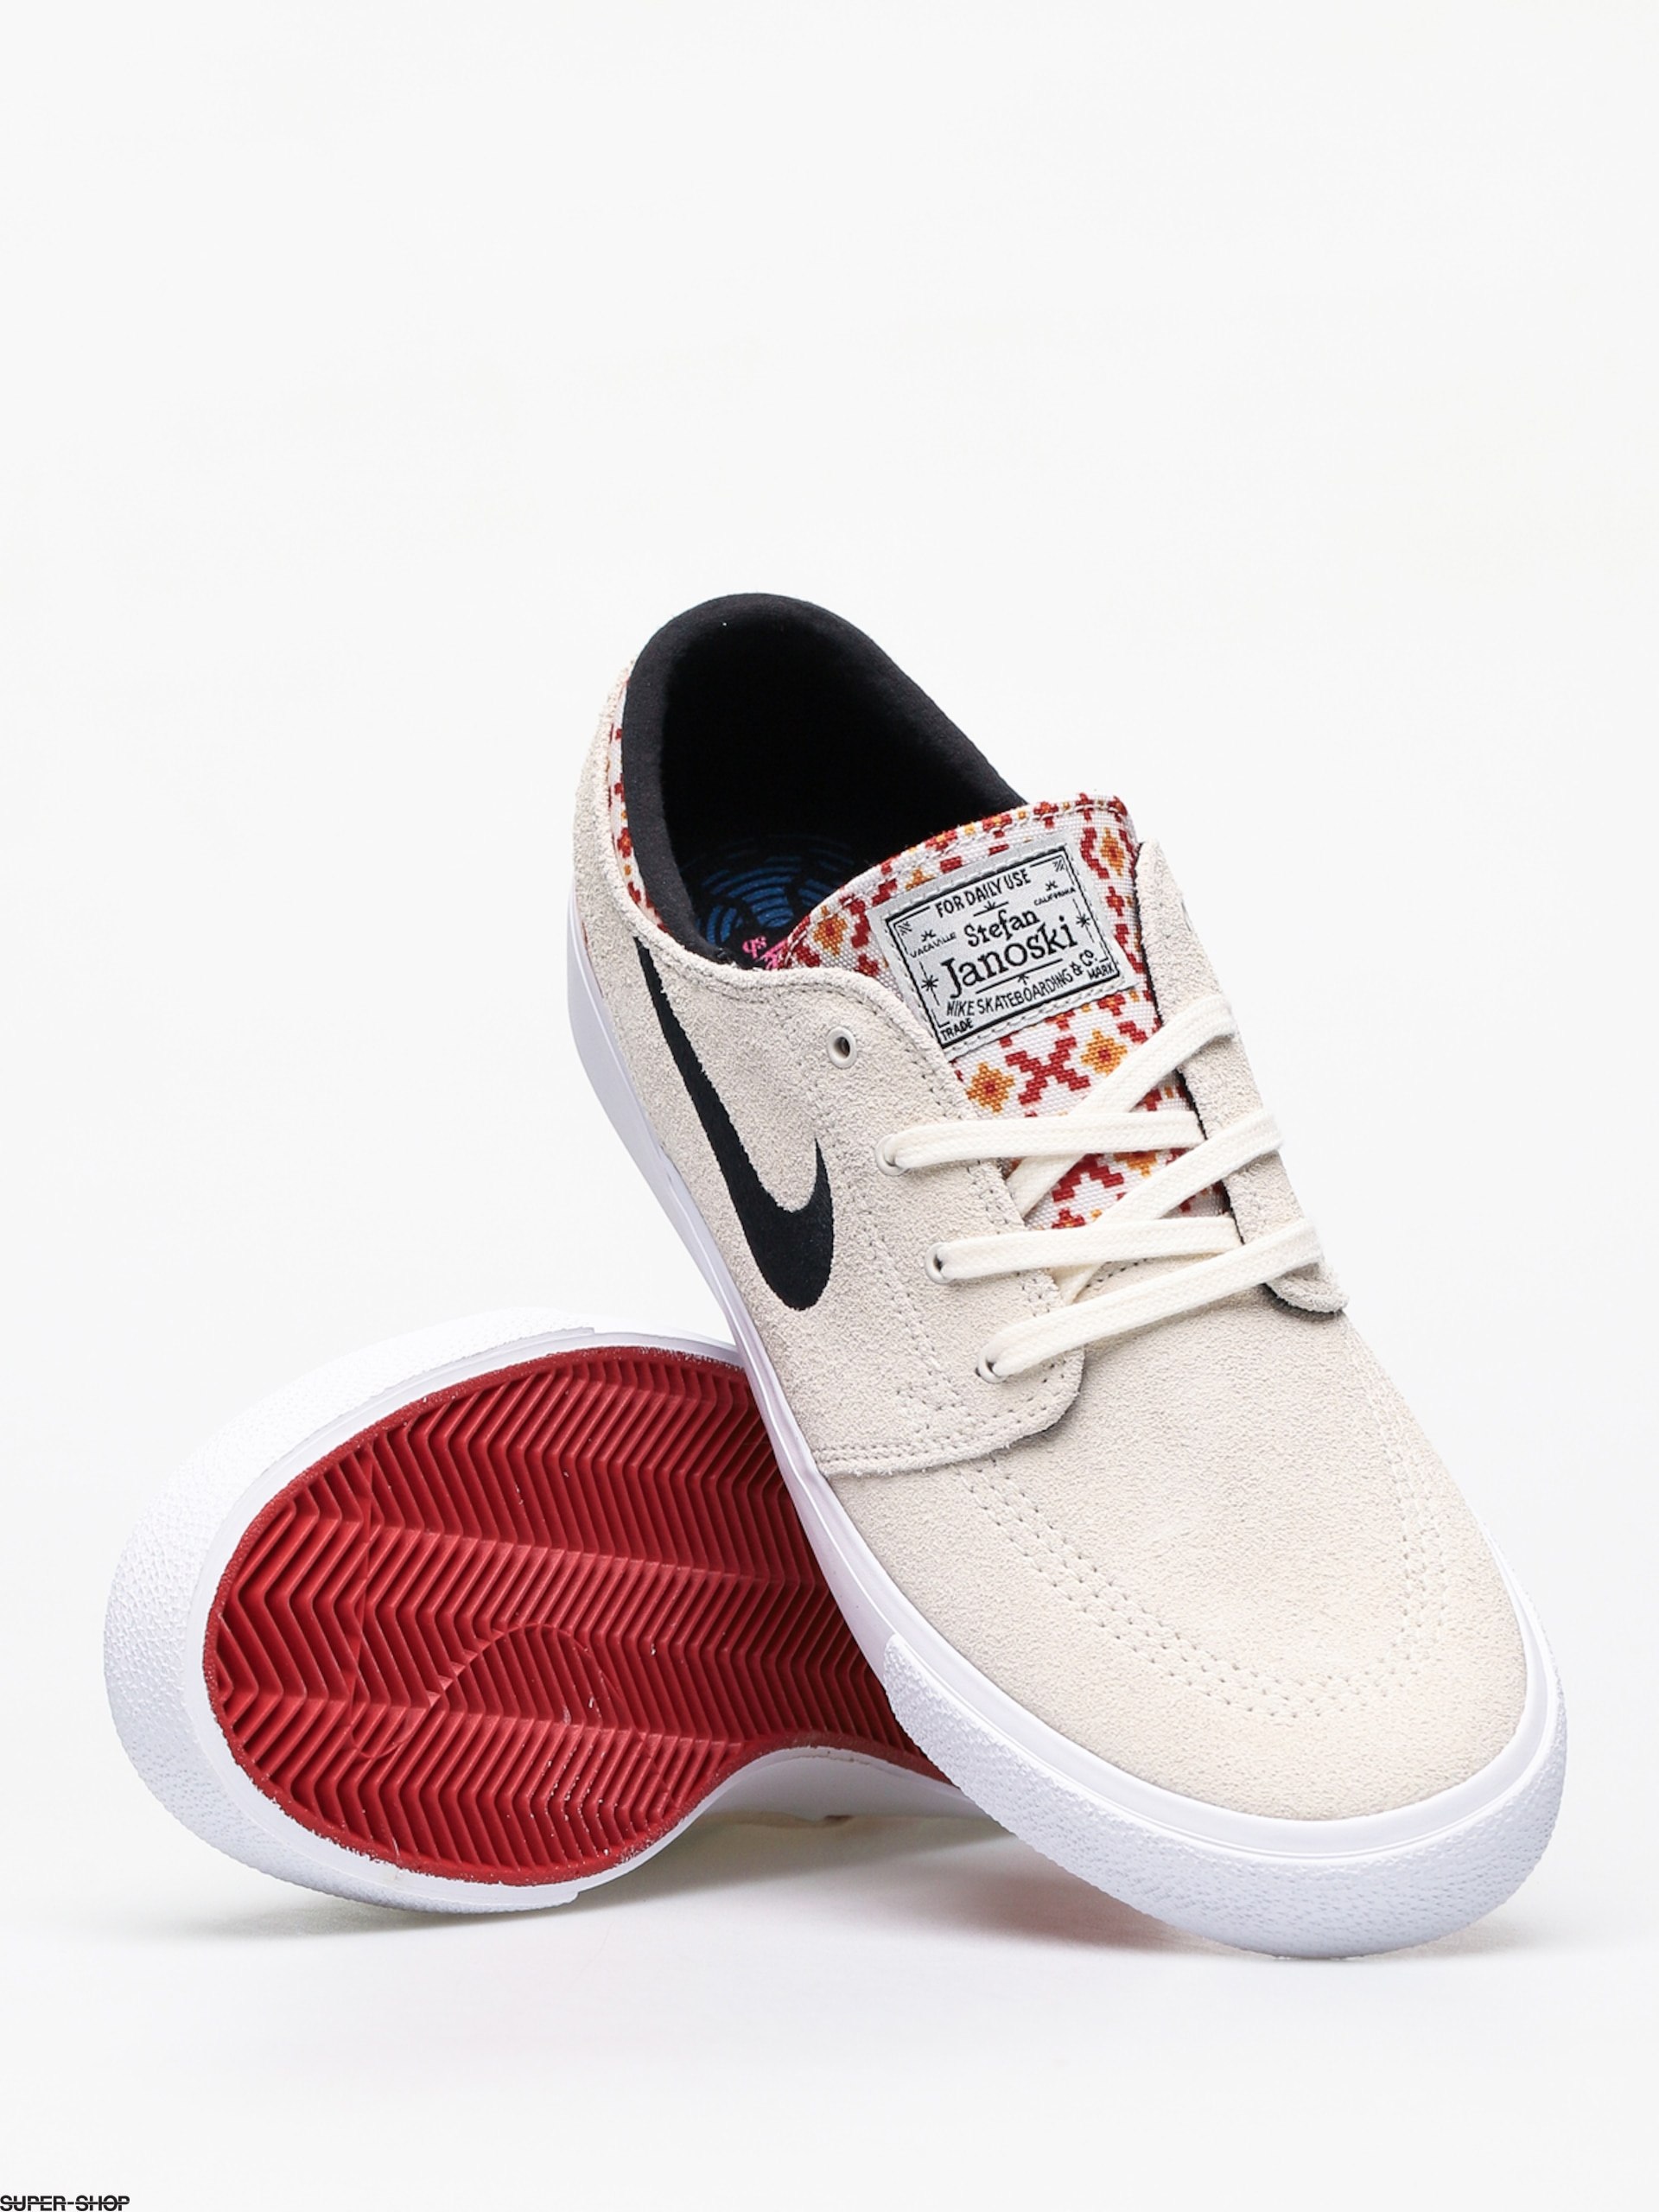 Nike SB Zoom Janoski Rm Premium Shoes (pale ivoryblack mystic red pale ivory)